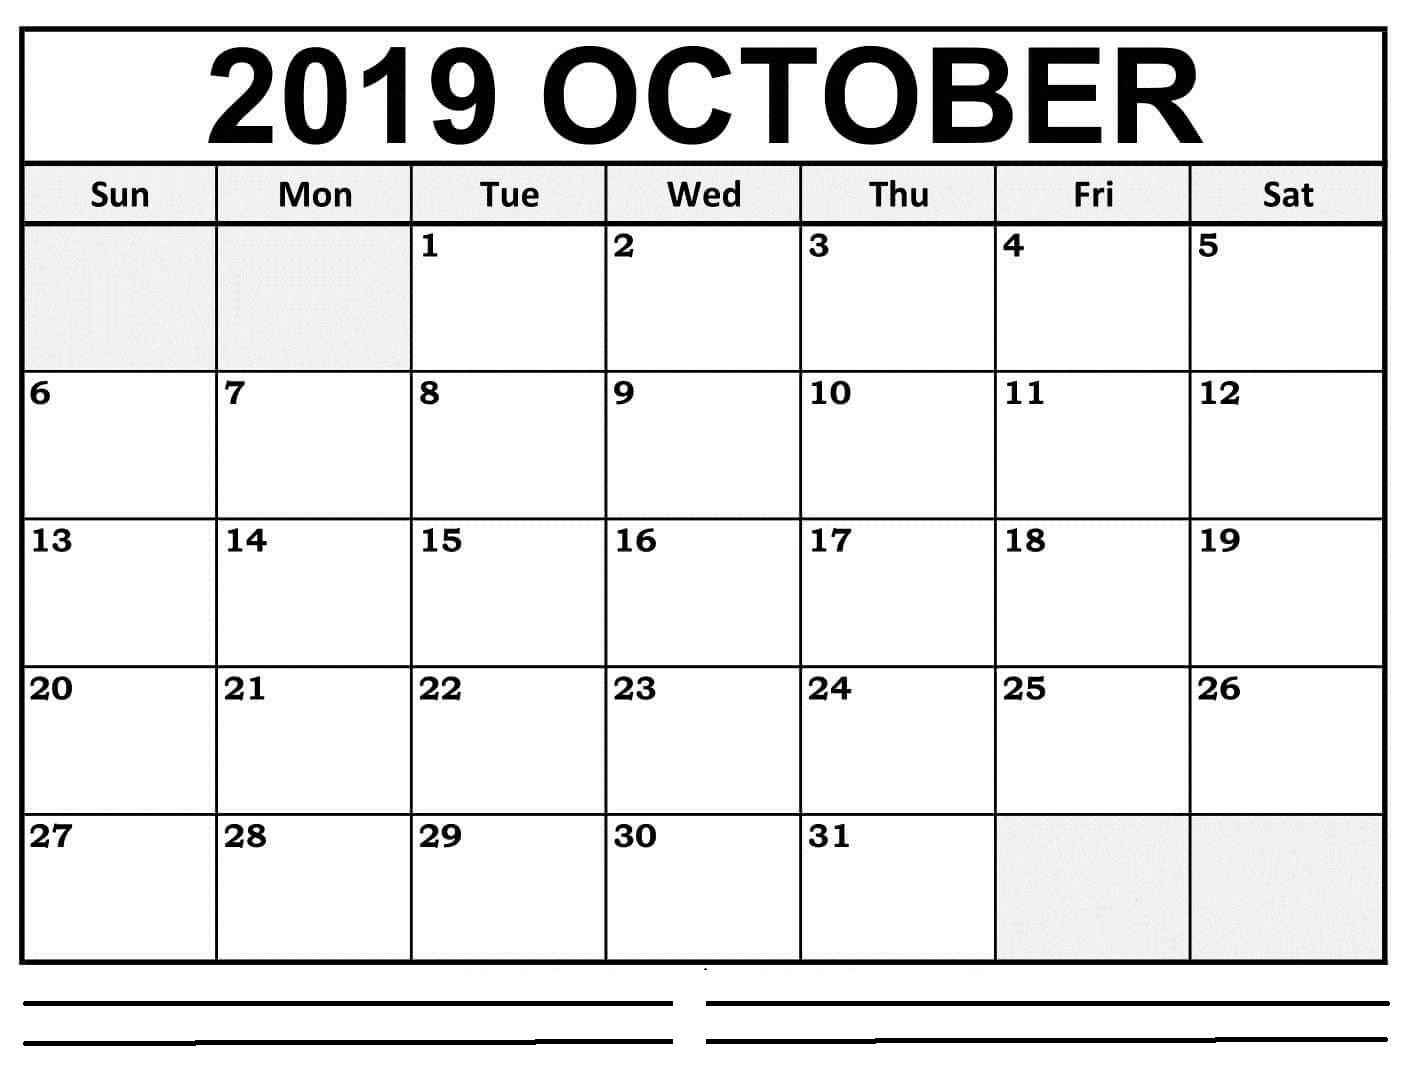 Excel October 2019 Monthly Calendar Calendar Holiday